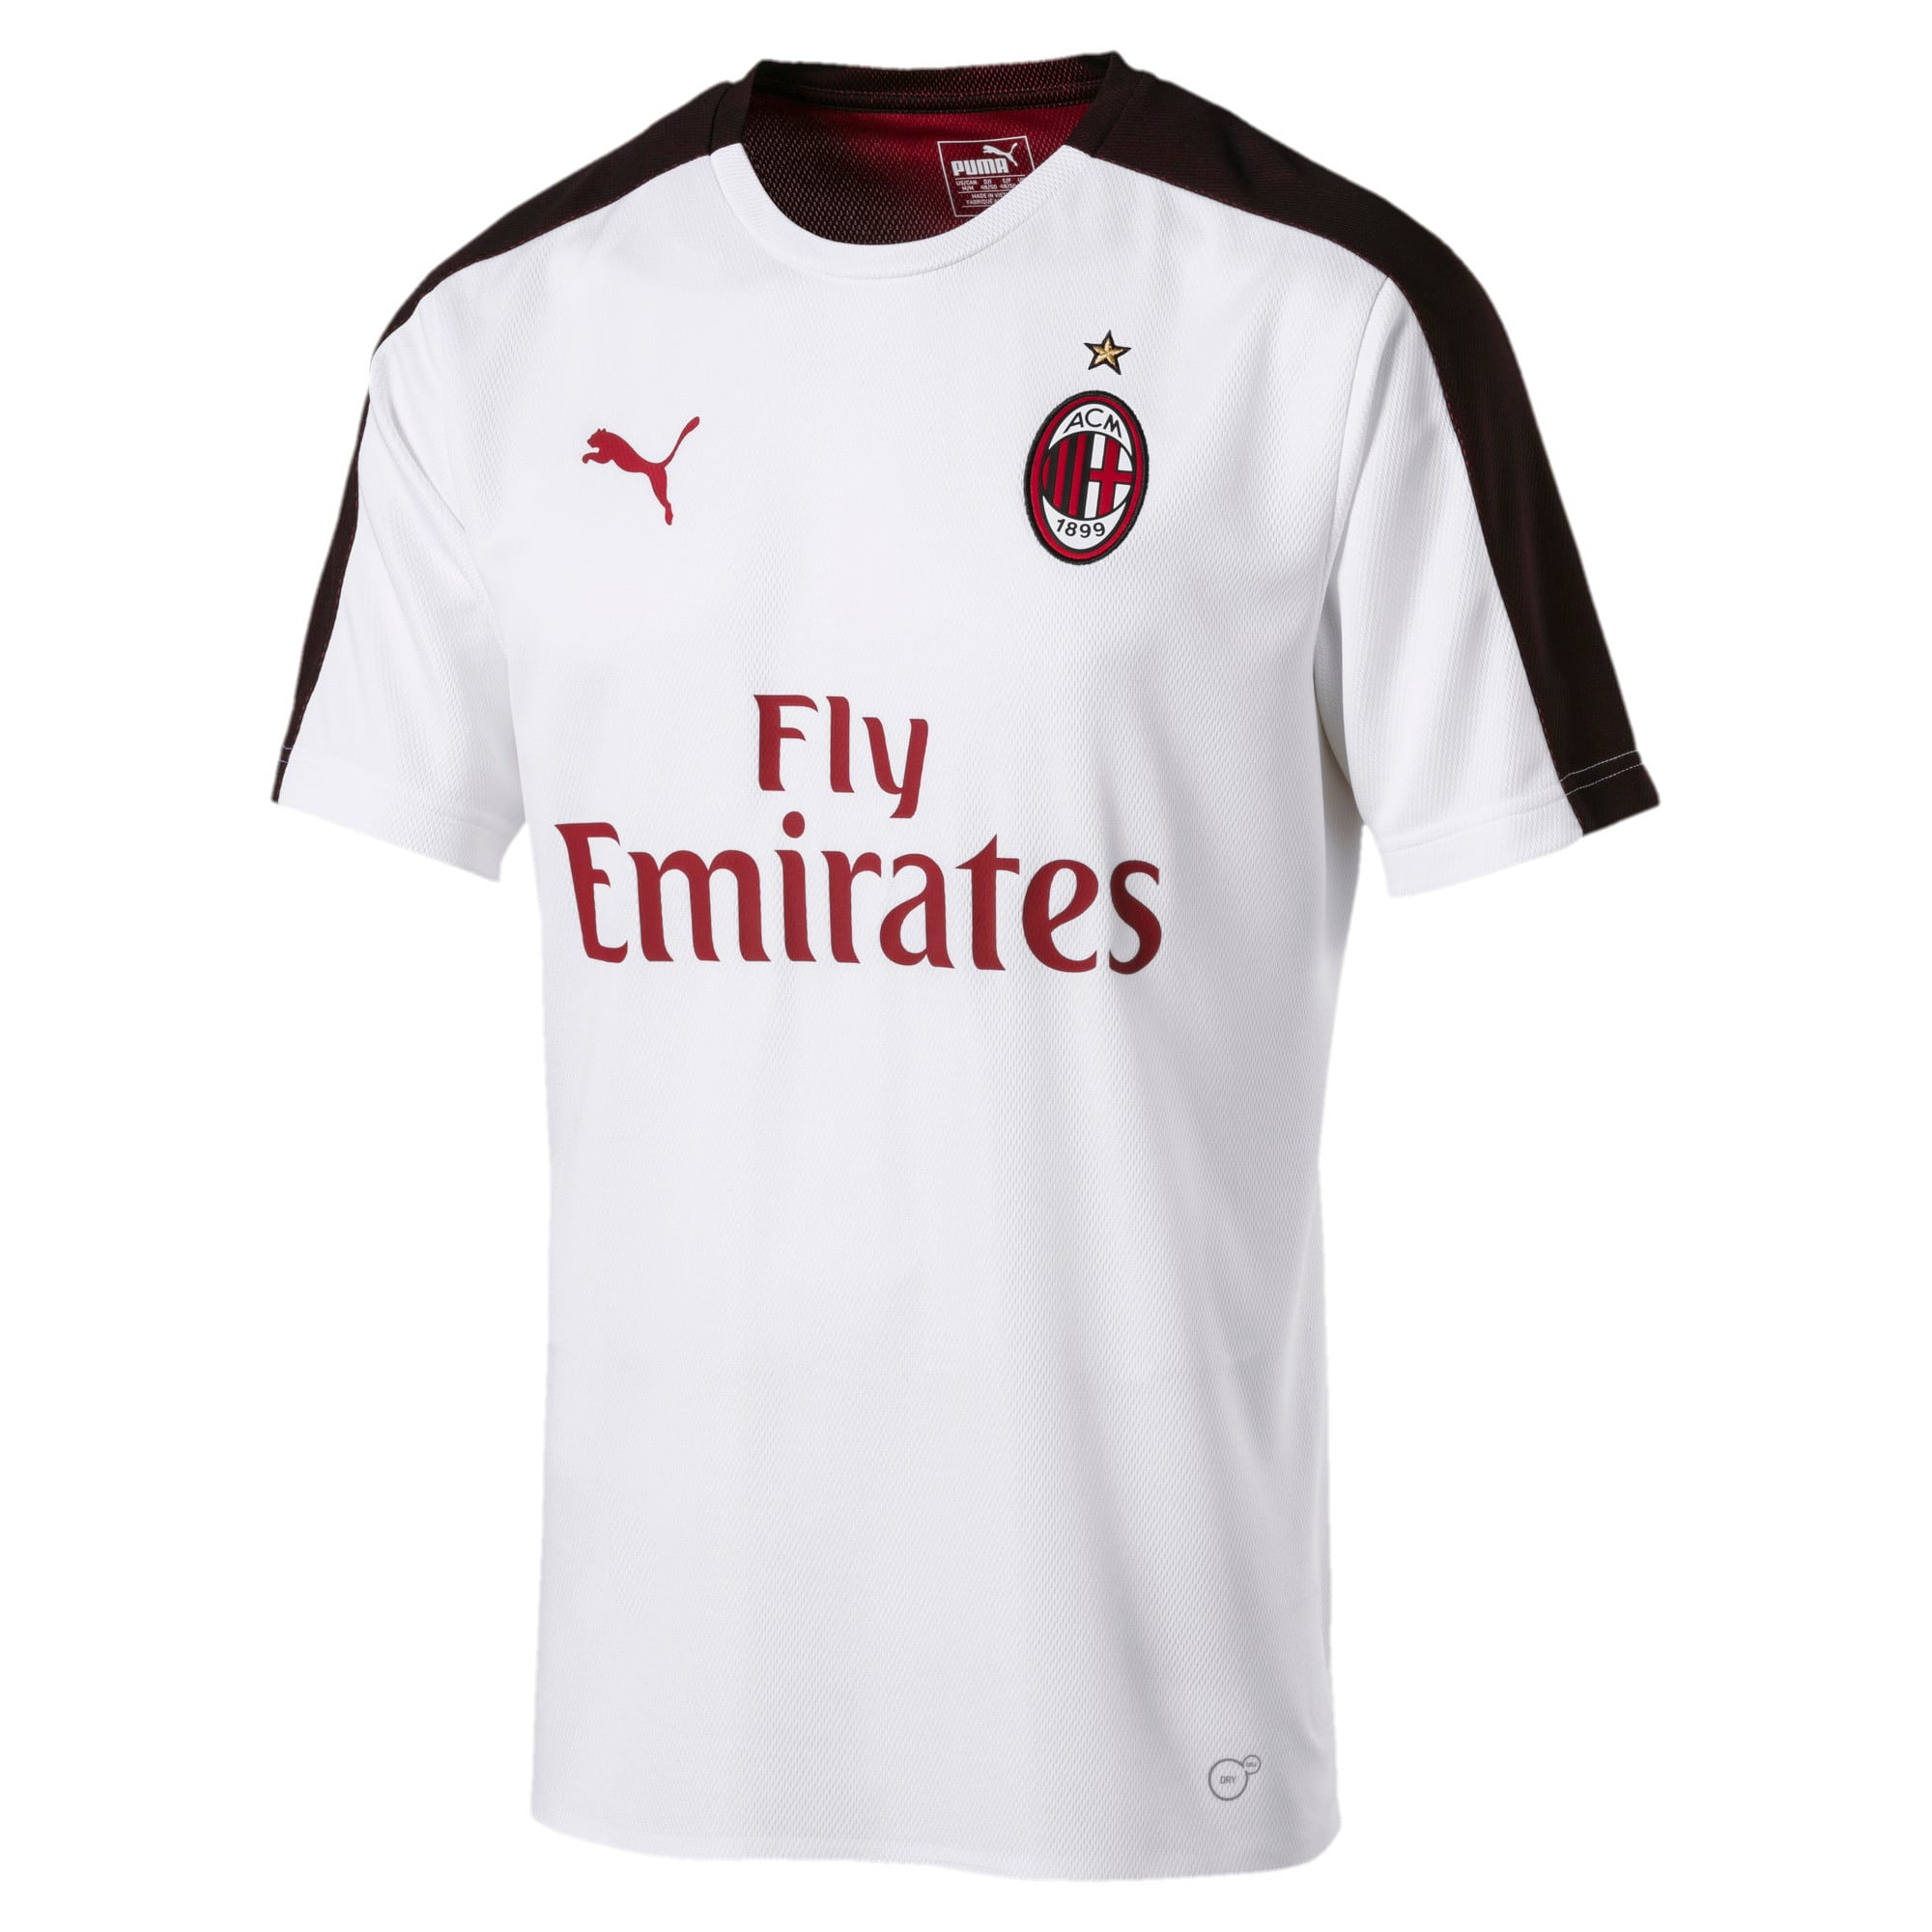 Thumbnail 1 of AC Milan Men's Stadium Jersey, Puma White-Puma Black, medium